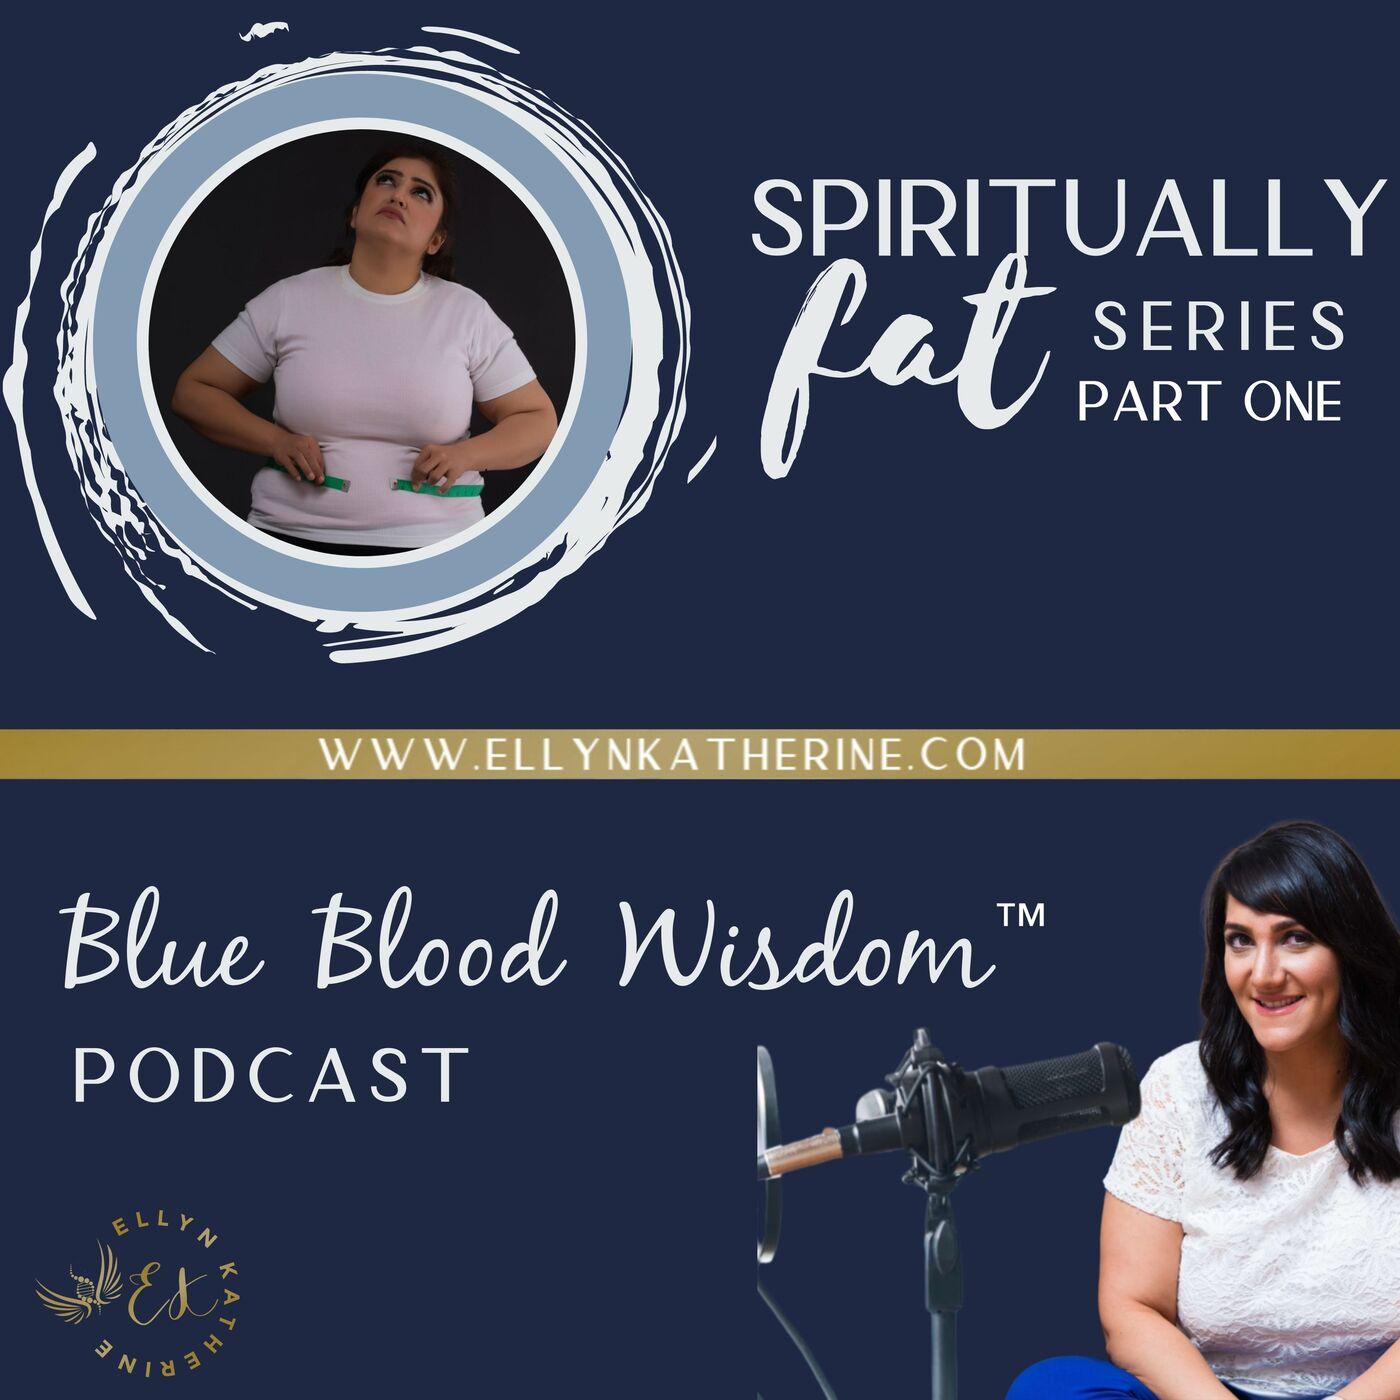 Spiritually Fat [Part One]